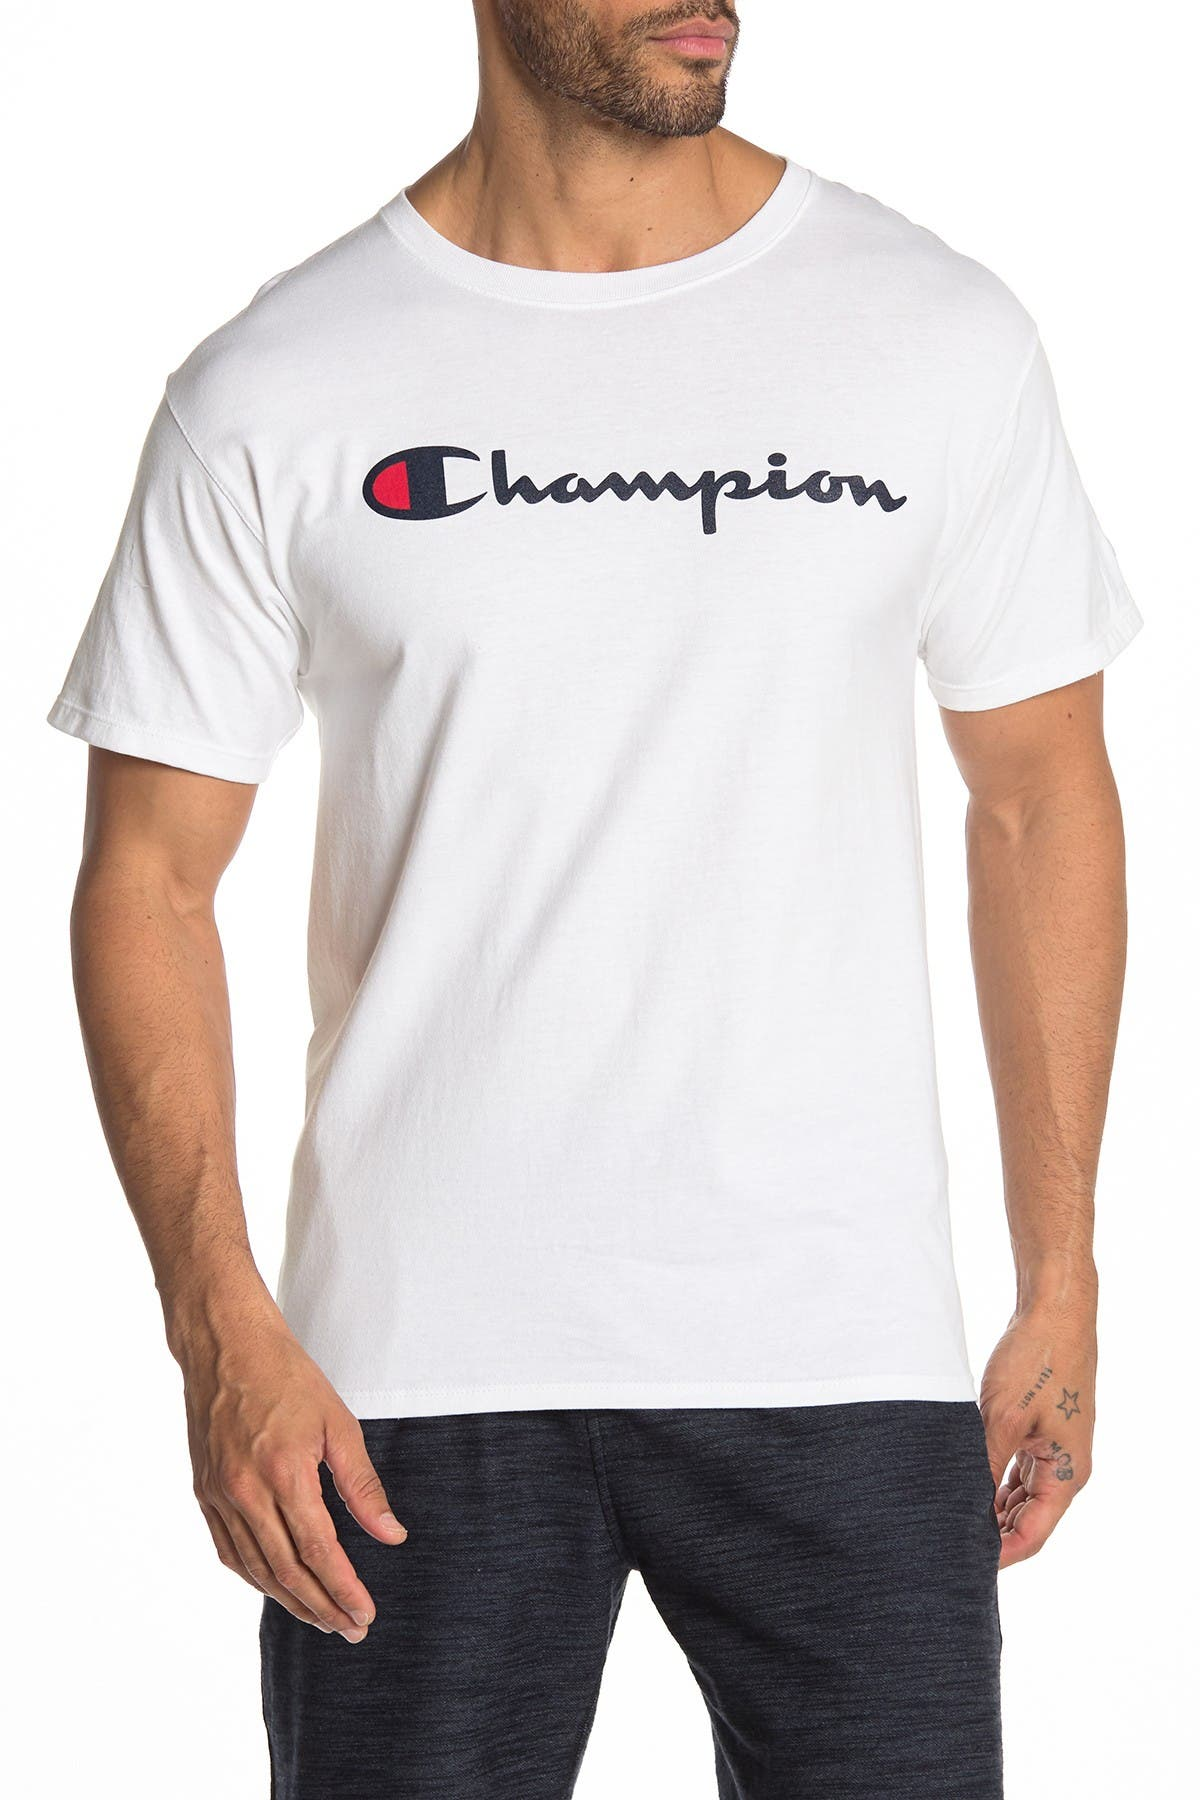 Image of Champion Logo Print Crew Neck T-Shirt